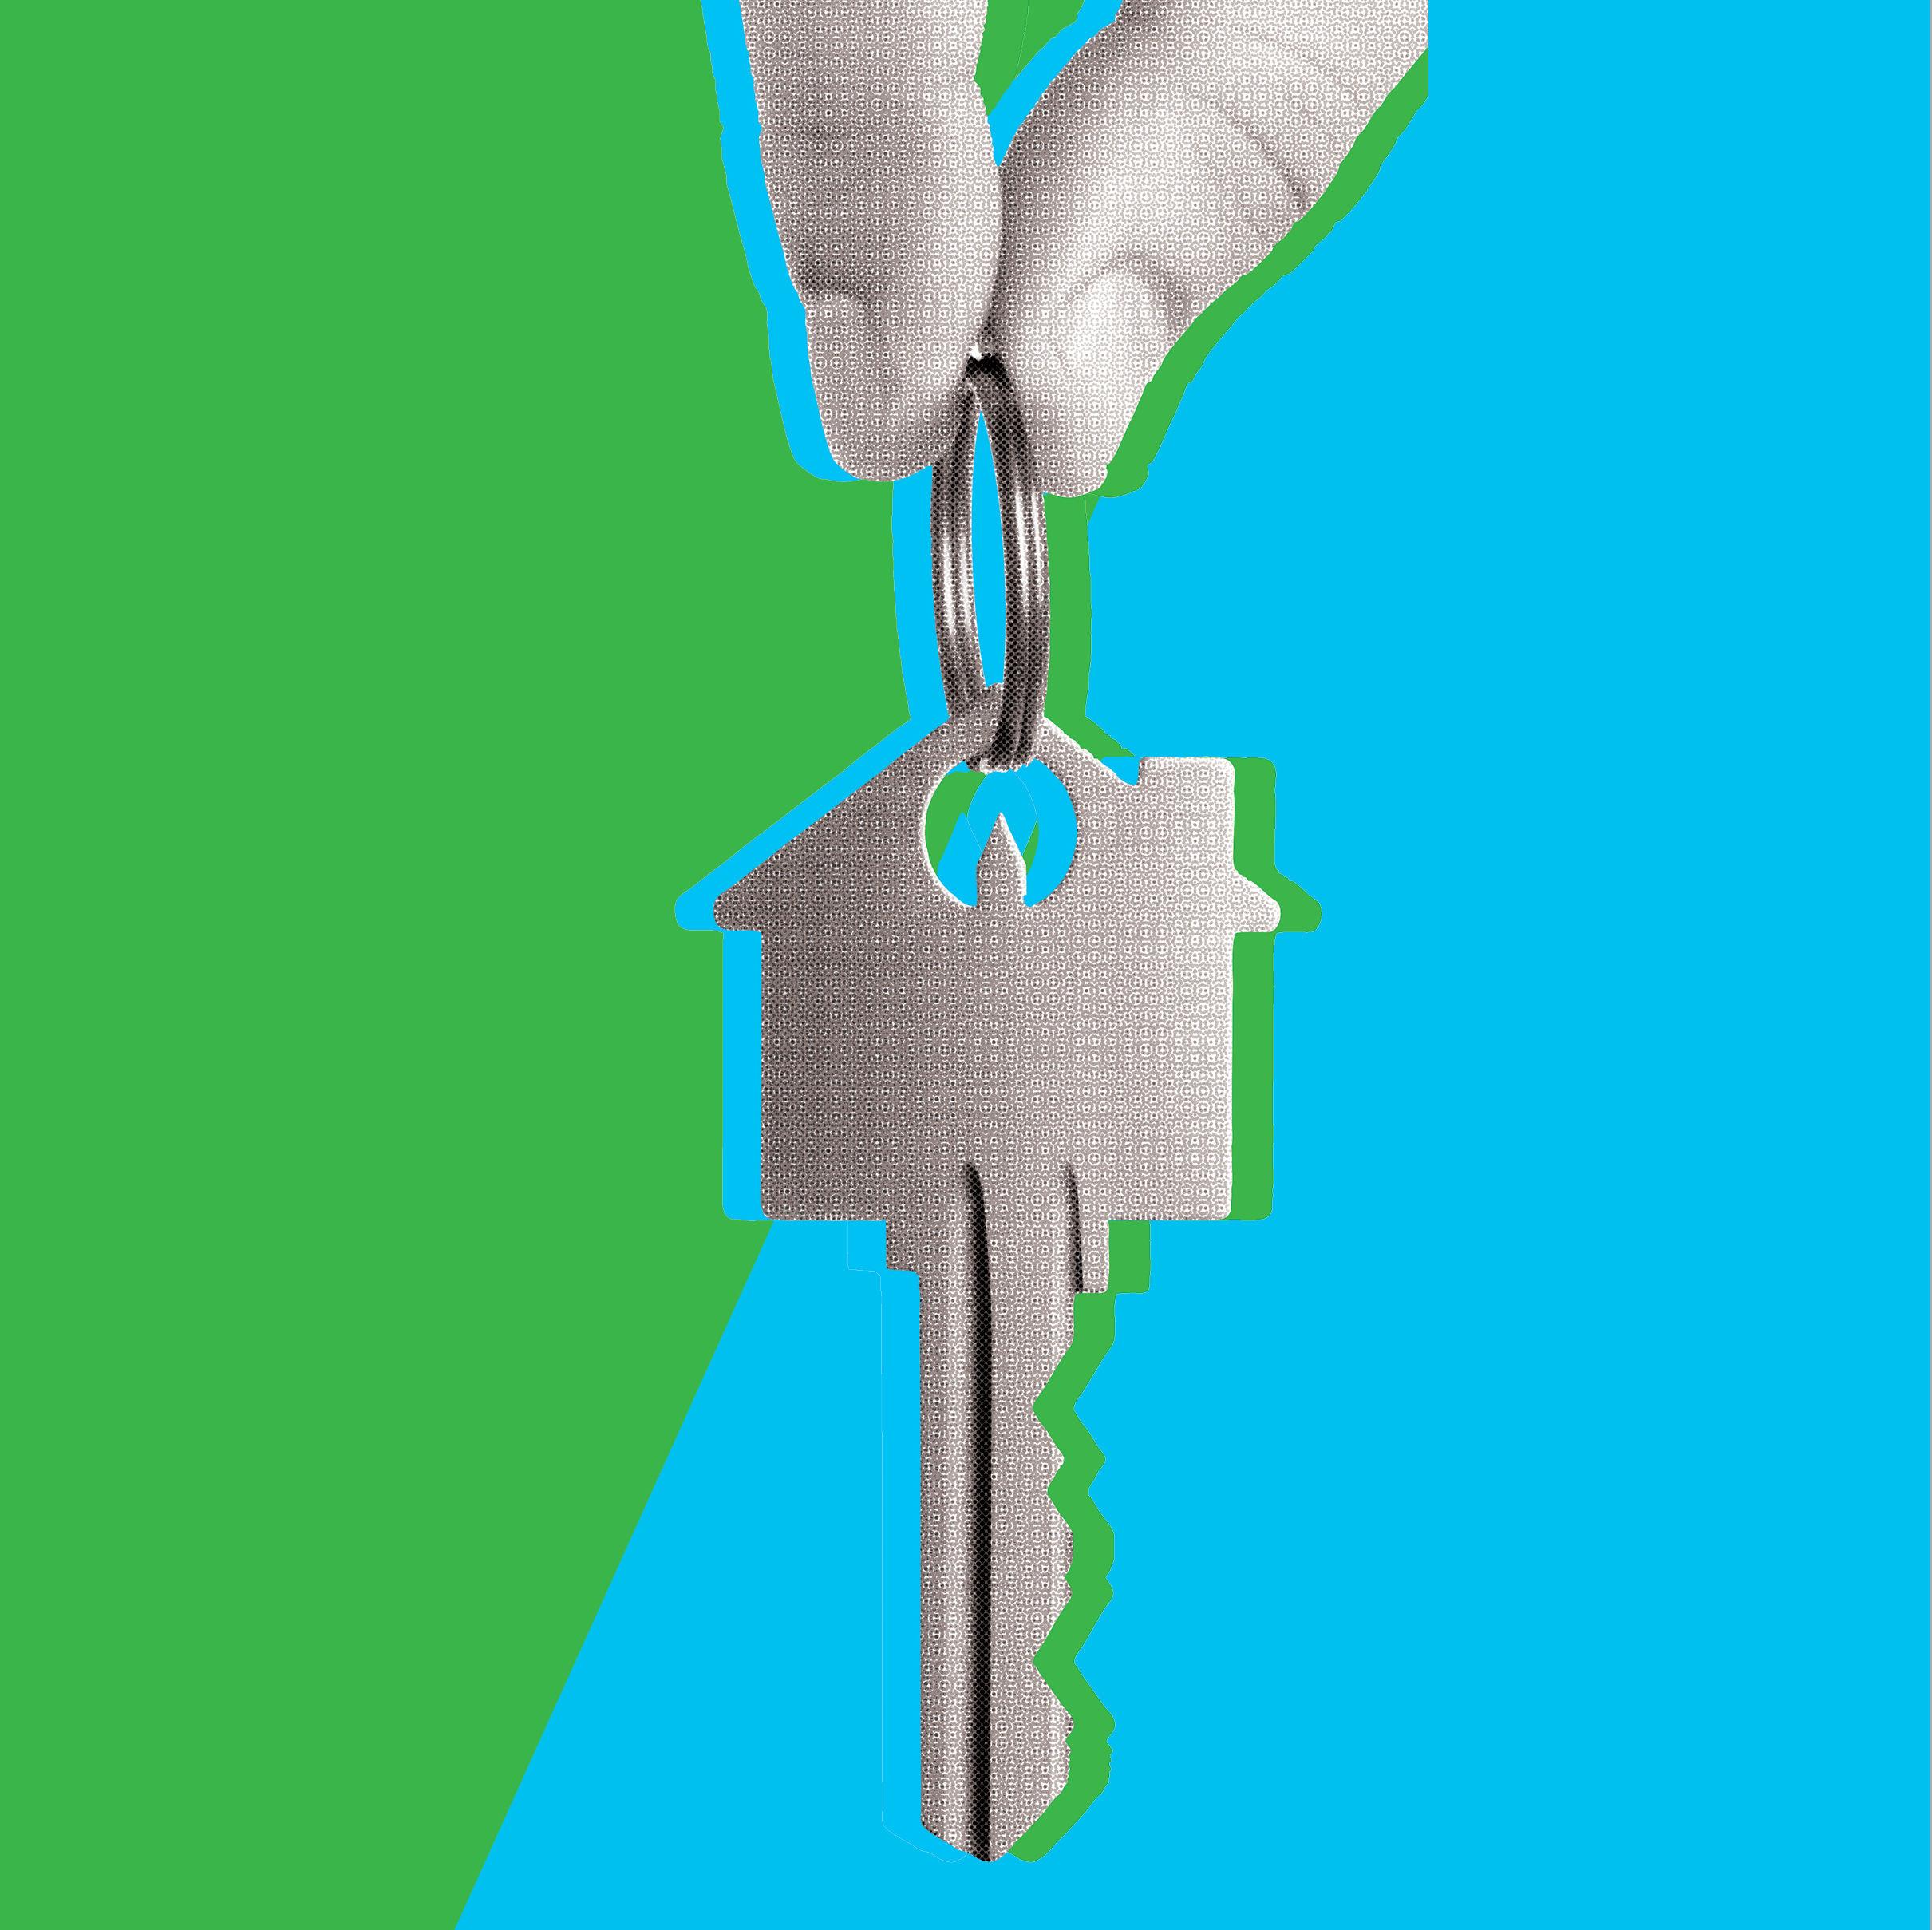 0418 shakedown homeownership oajozm